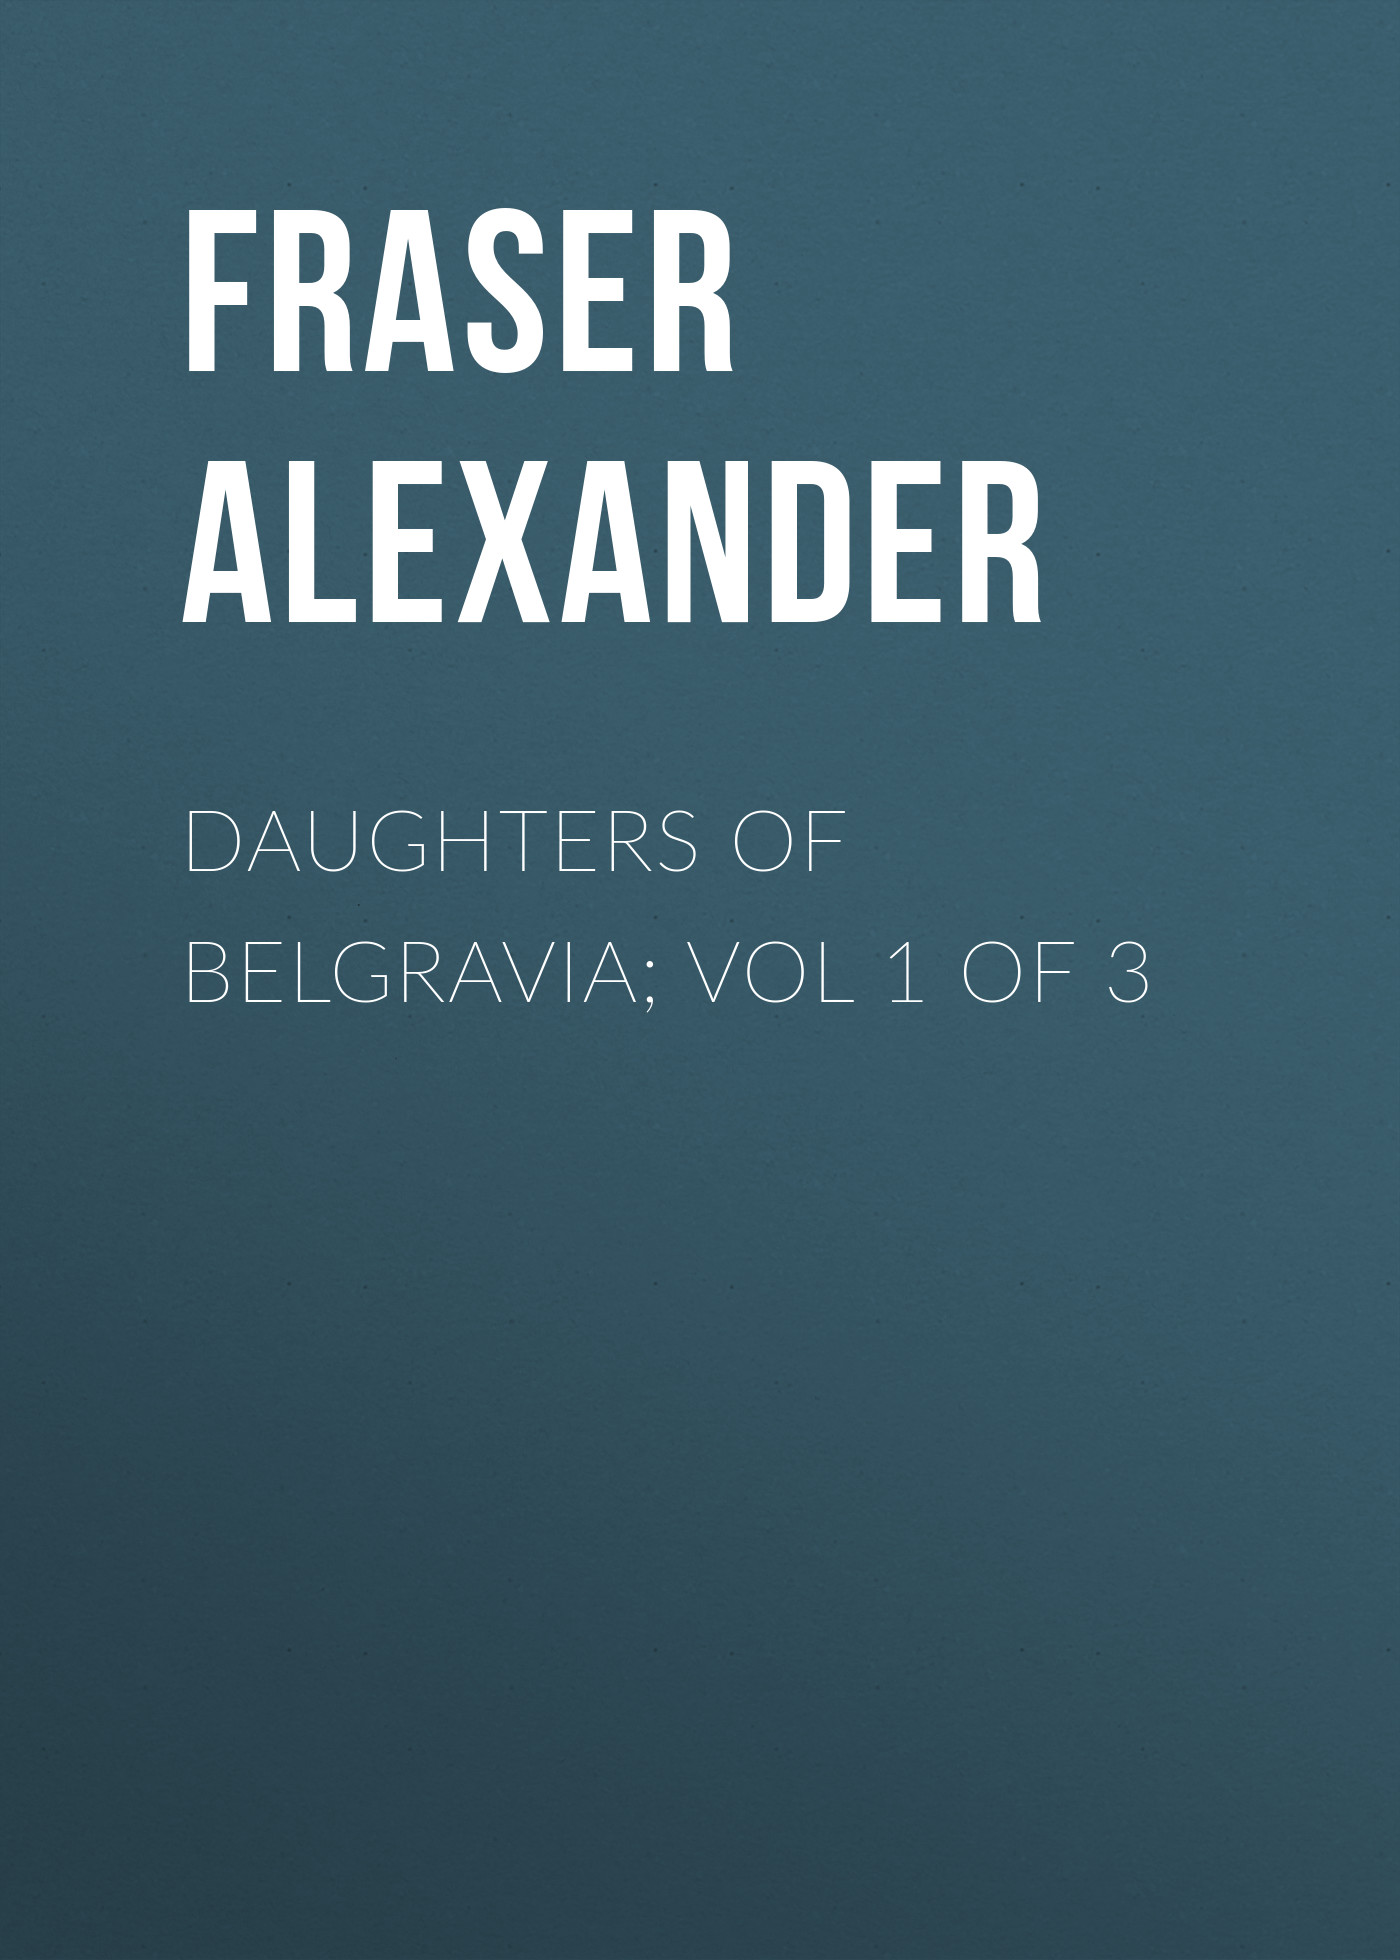 Fraser Alexander Daughters of Belgravia; vol 1 of 3 футболка print bar daughters of antipathy